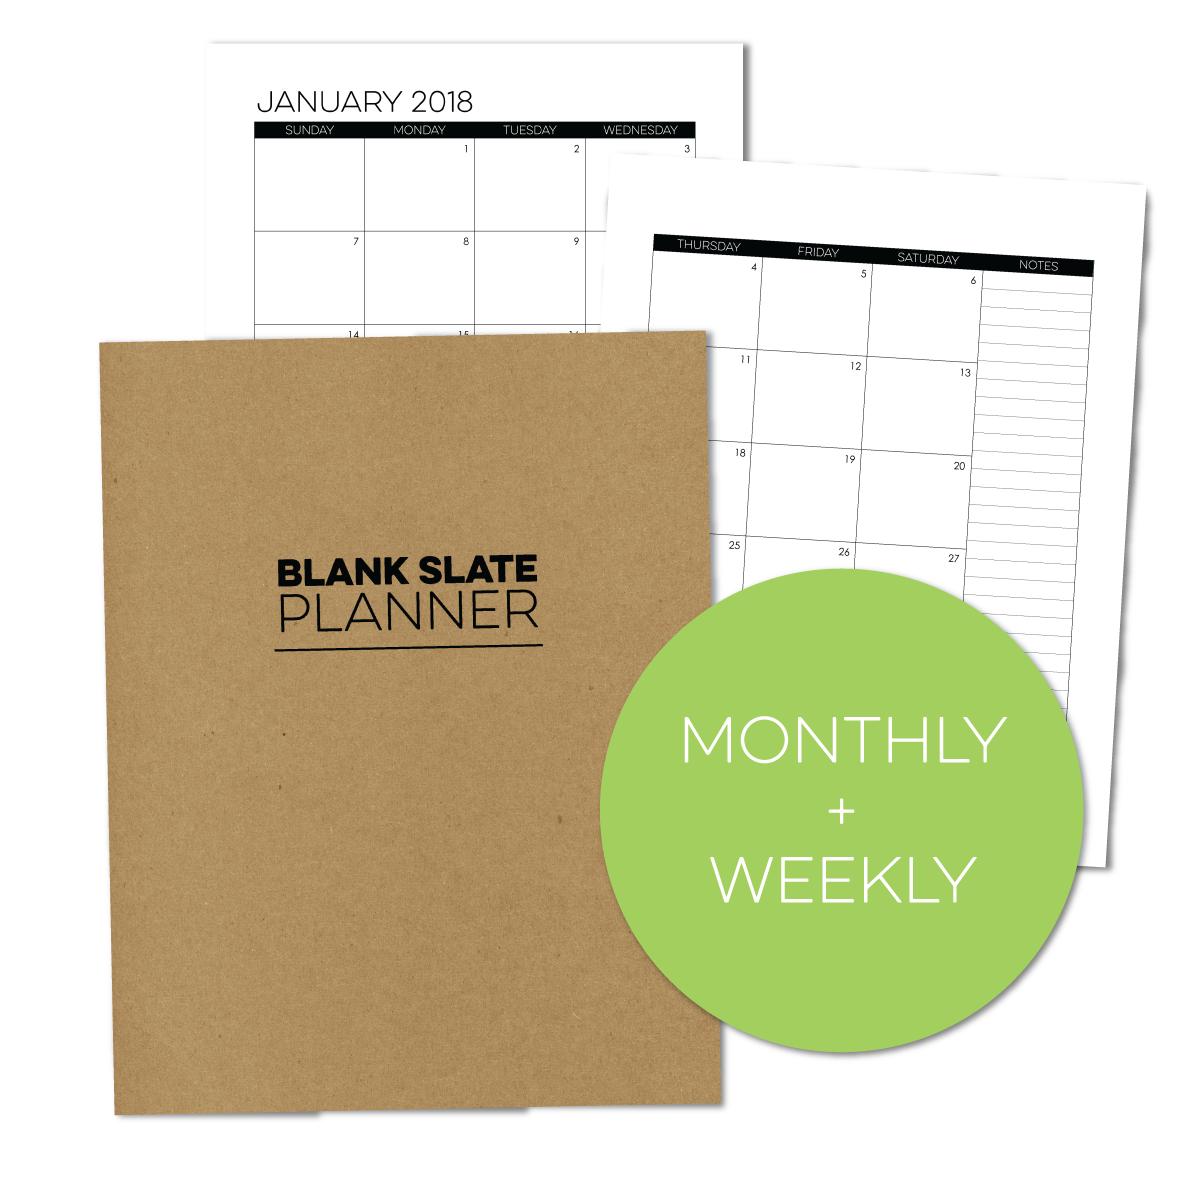 7x9 Blank Slate WEEKLY PLANNER | Limelife Planners | Pinterest ...